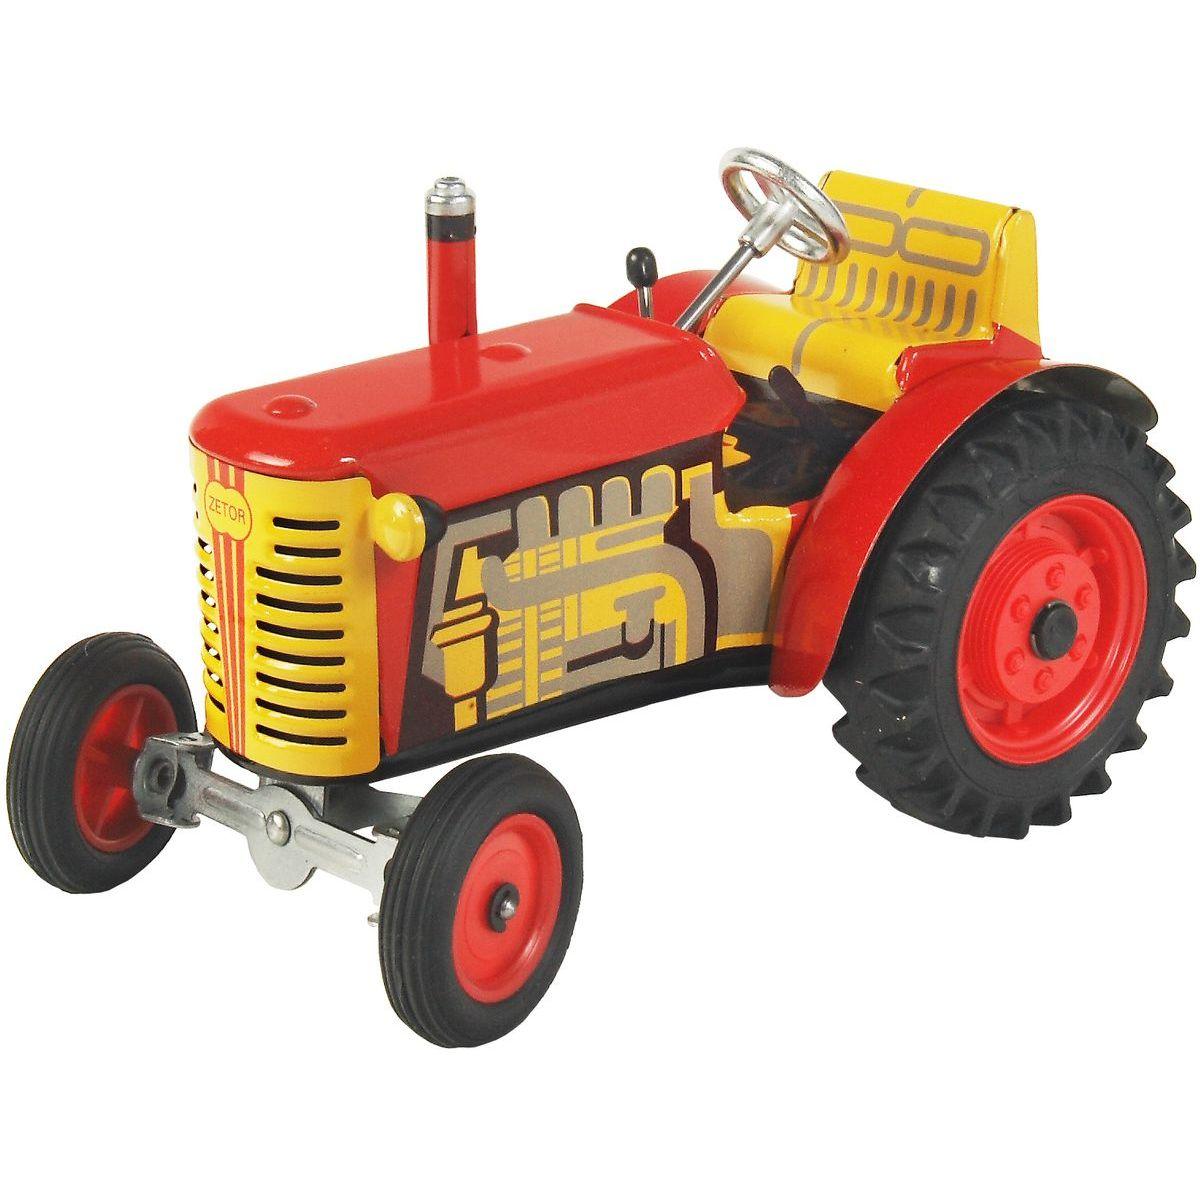 Kovap Traktor Zetor - Červený